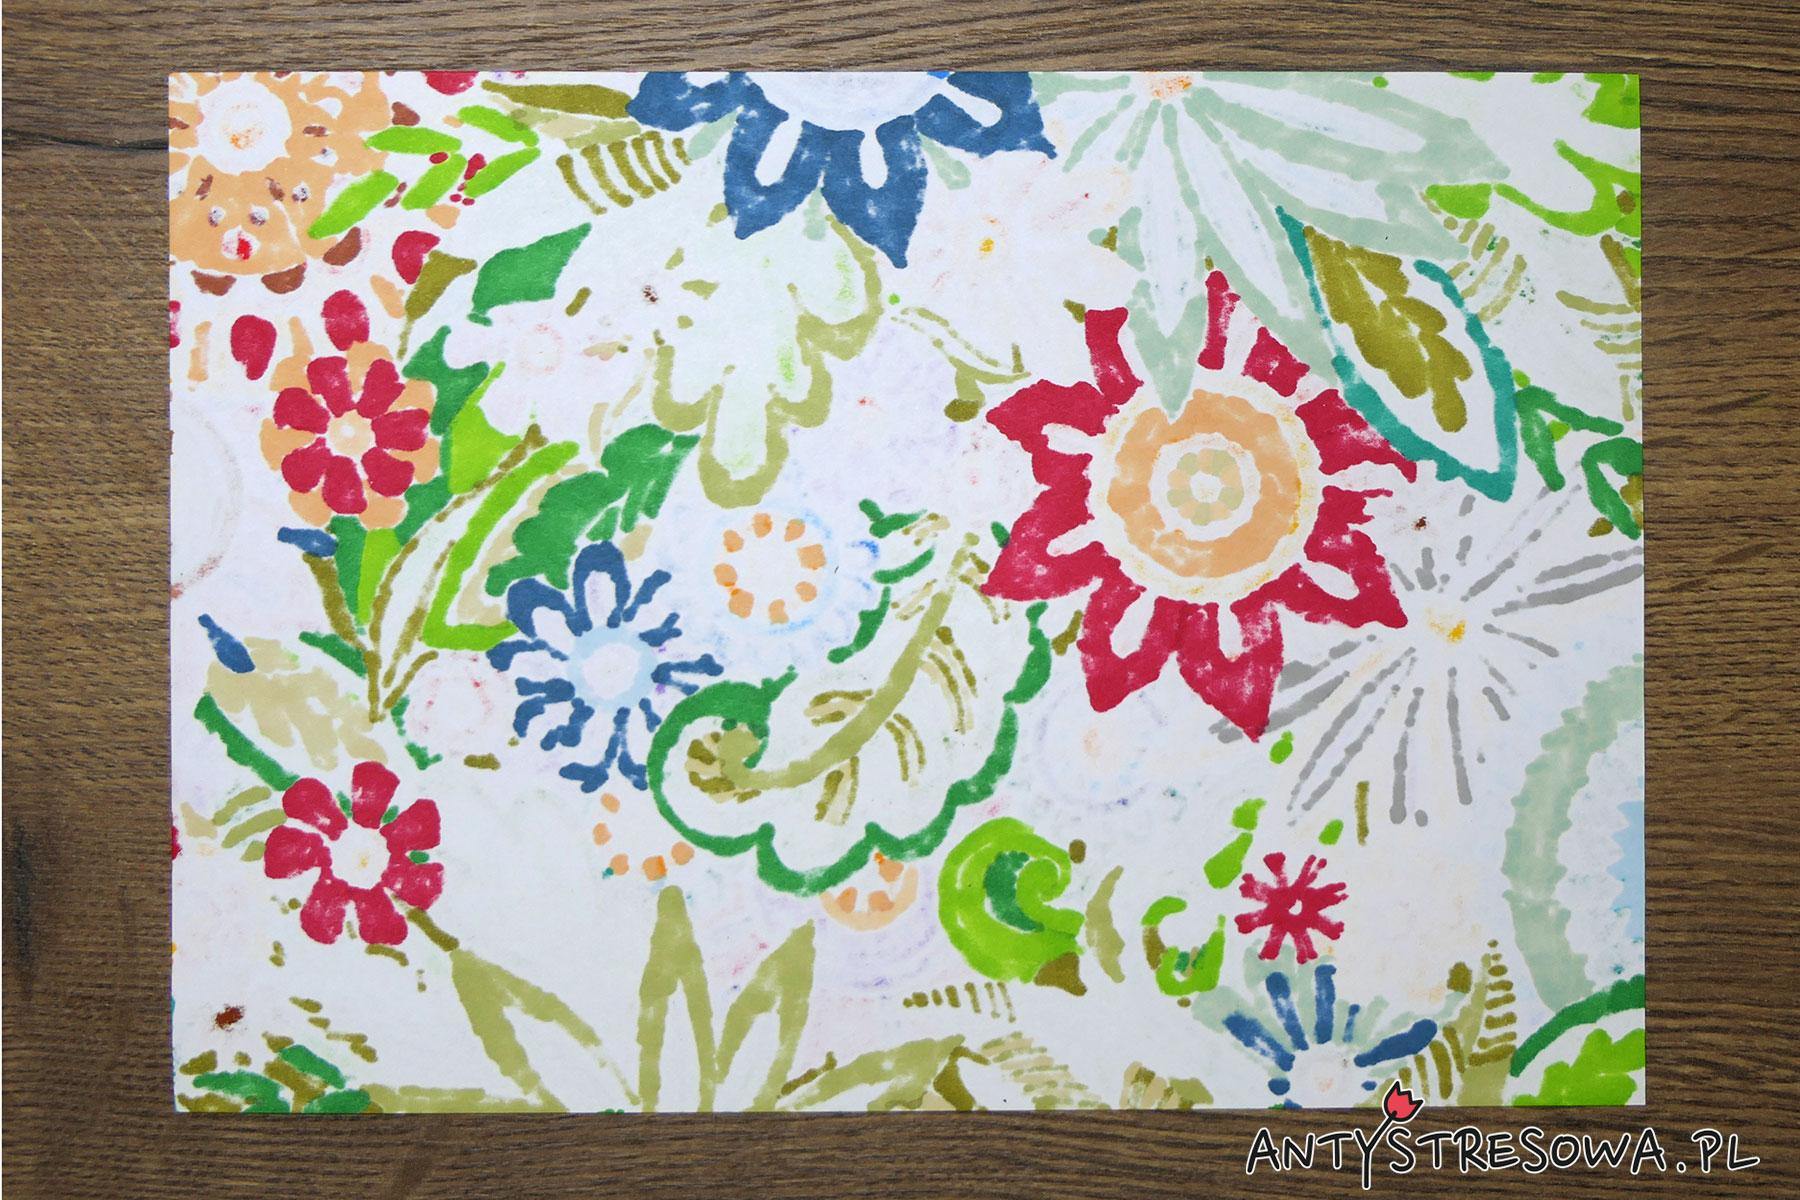 Kolorowanka wykonana  pisakami Clean Color Dot, Art and Graphic Twin, Promarkerami i markerami Chameleon